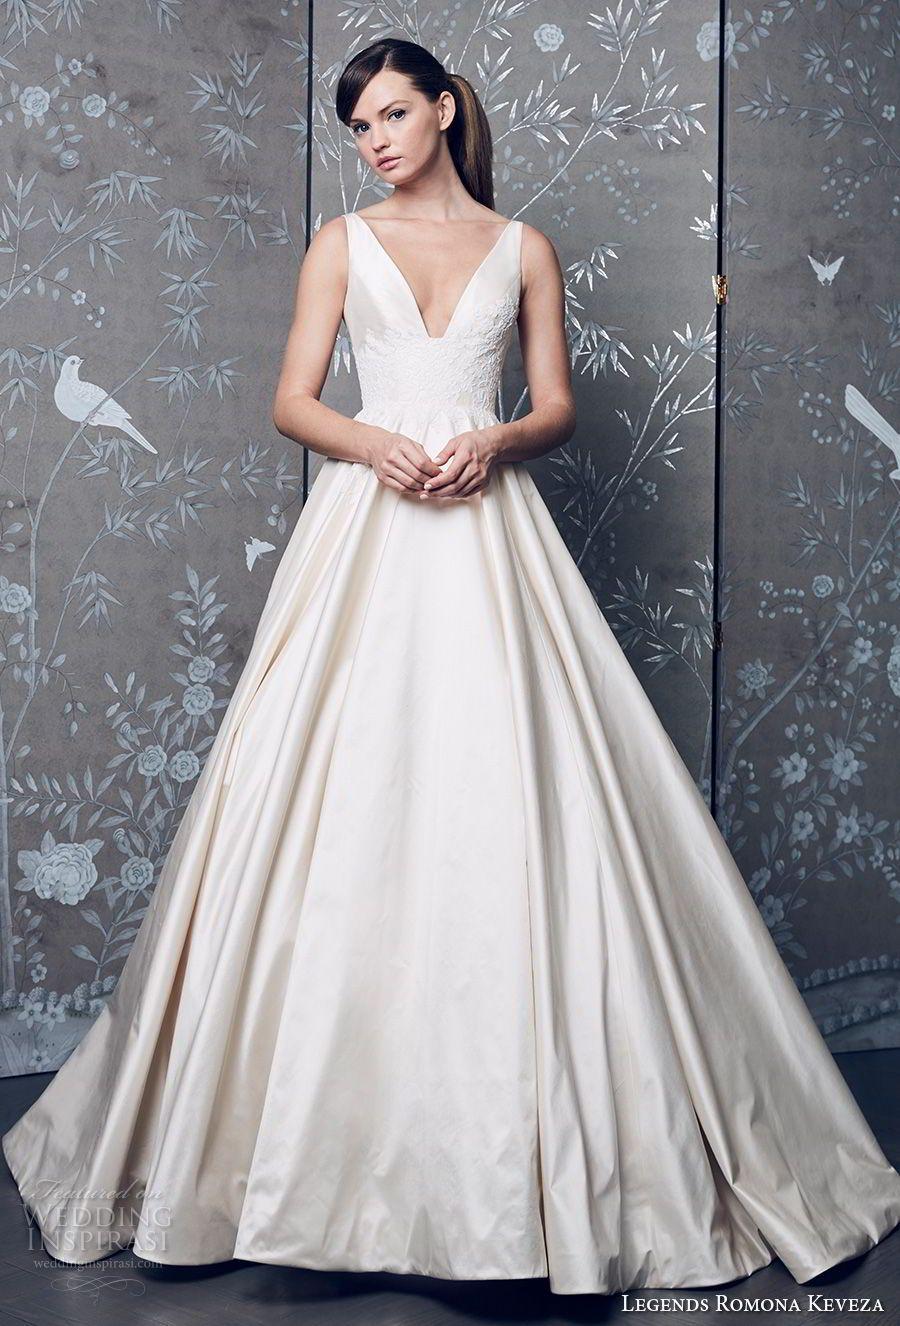 legends romona keveza fall 2018 sleeveless deep v neck simple light  embellished bodice satin skirt classic a line wedding dress (5) mv --  Legends Romona ... 8284e4b37